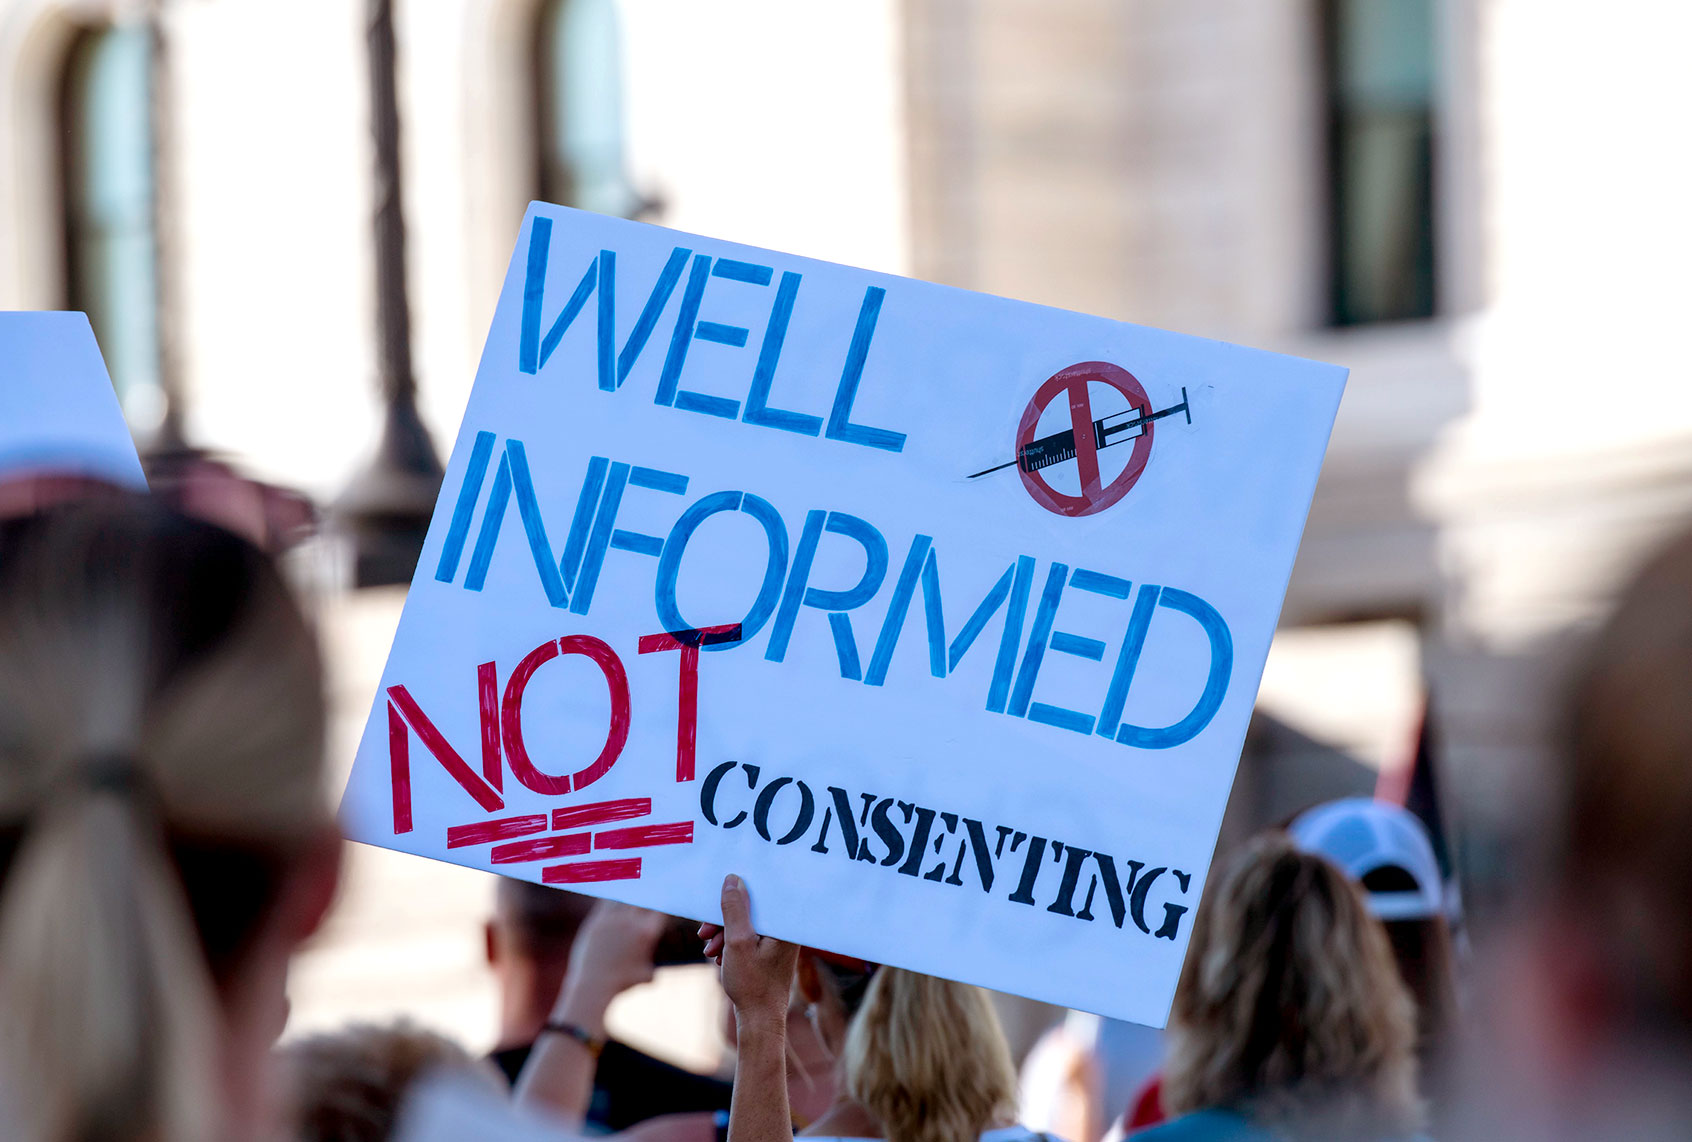 anti-vaccine-vaxx-protest-sign-1019211.j